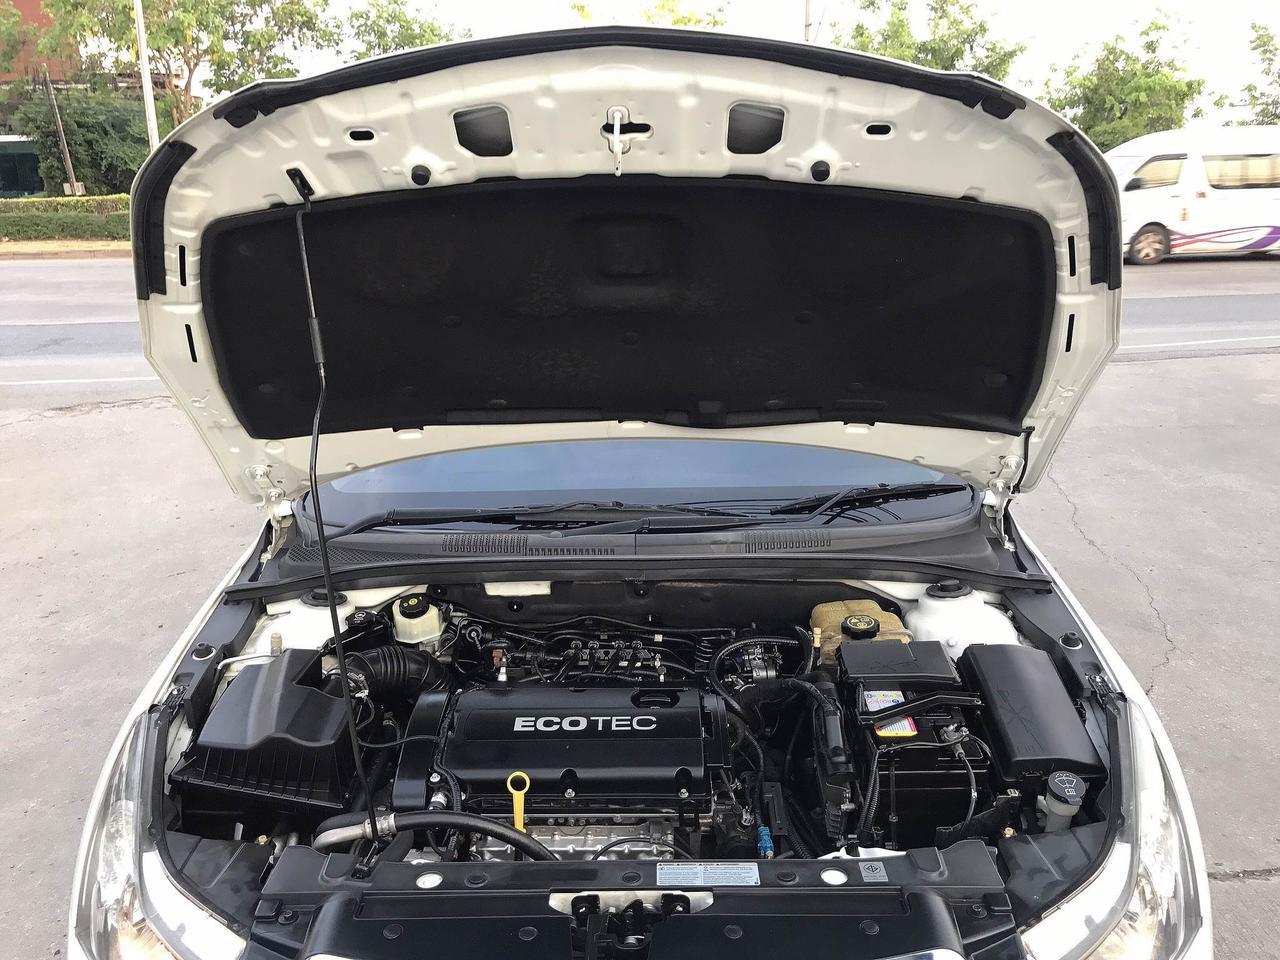 CHEVROLET CRUZE 1.8 LT auto ปี2011 สีขาว รถบ้านมือเดียวไม่มีชนสวยเดิม รูปที่ 6